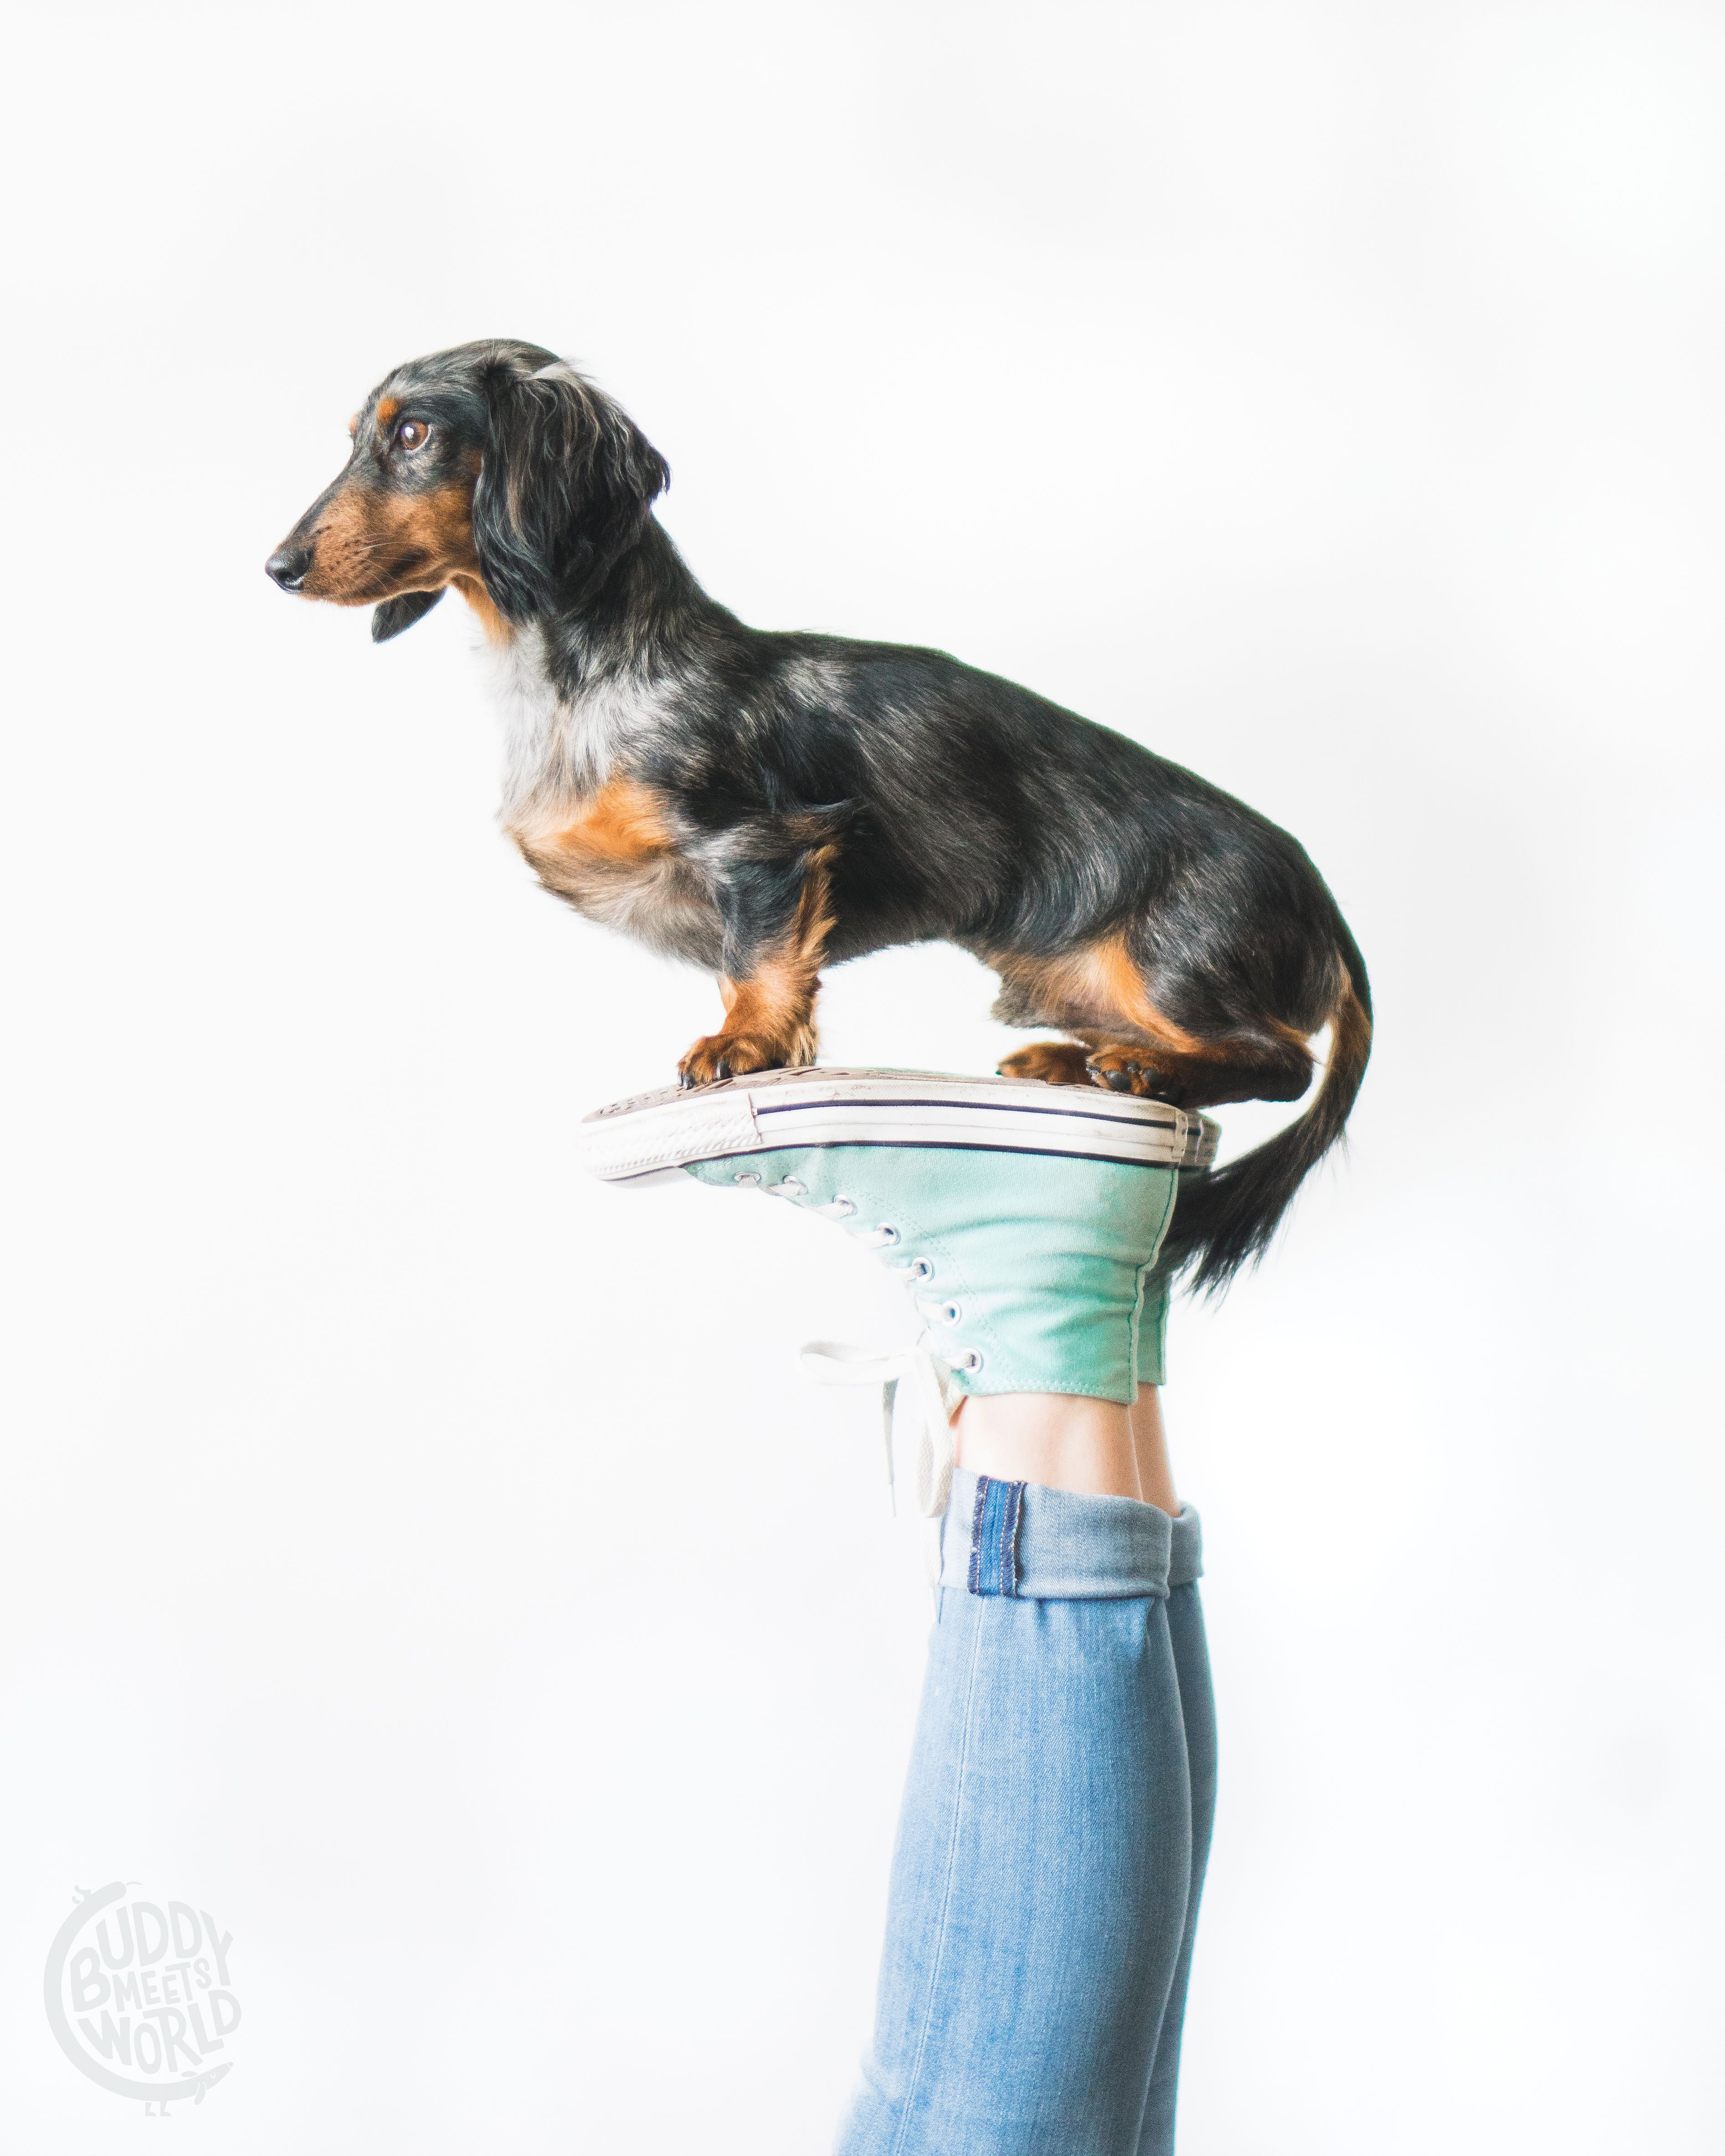 Ig Buddy Meets World Miniature Dachshund Dappled Dachshunds